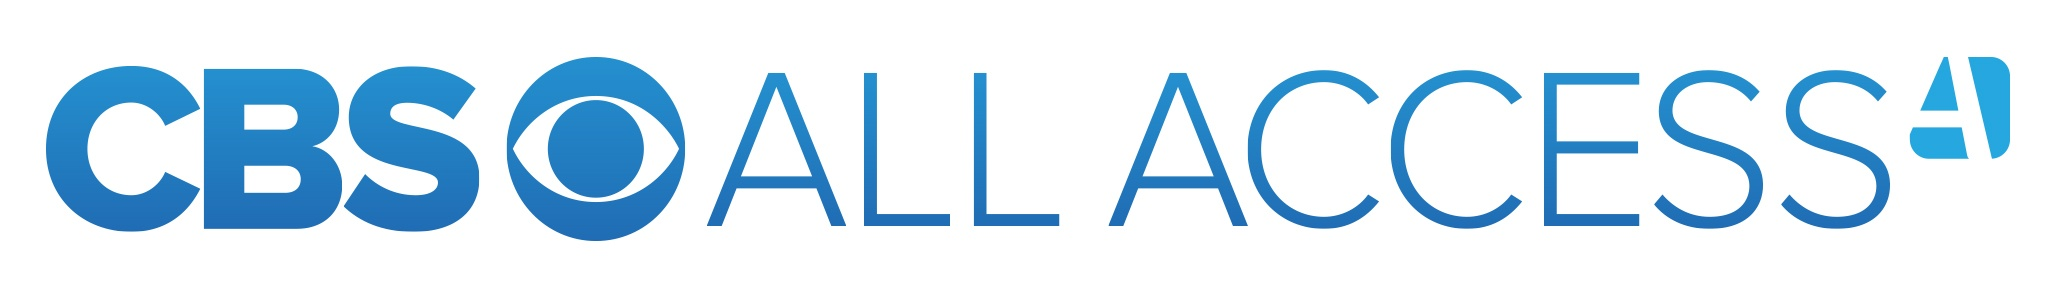 cbs-all-access-logo.jpg